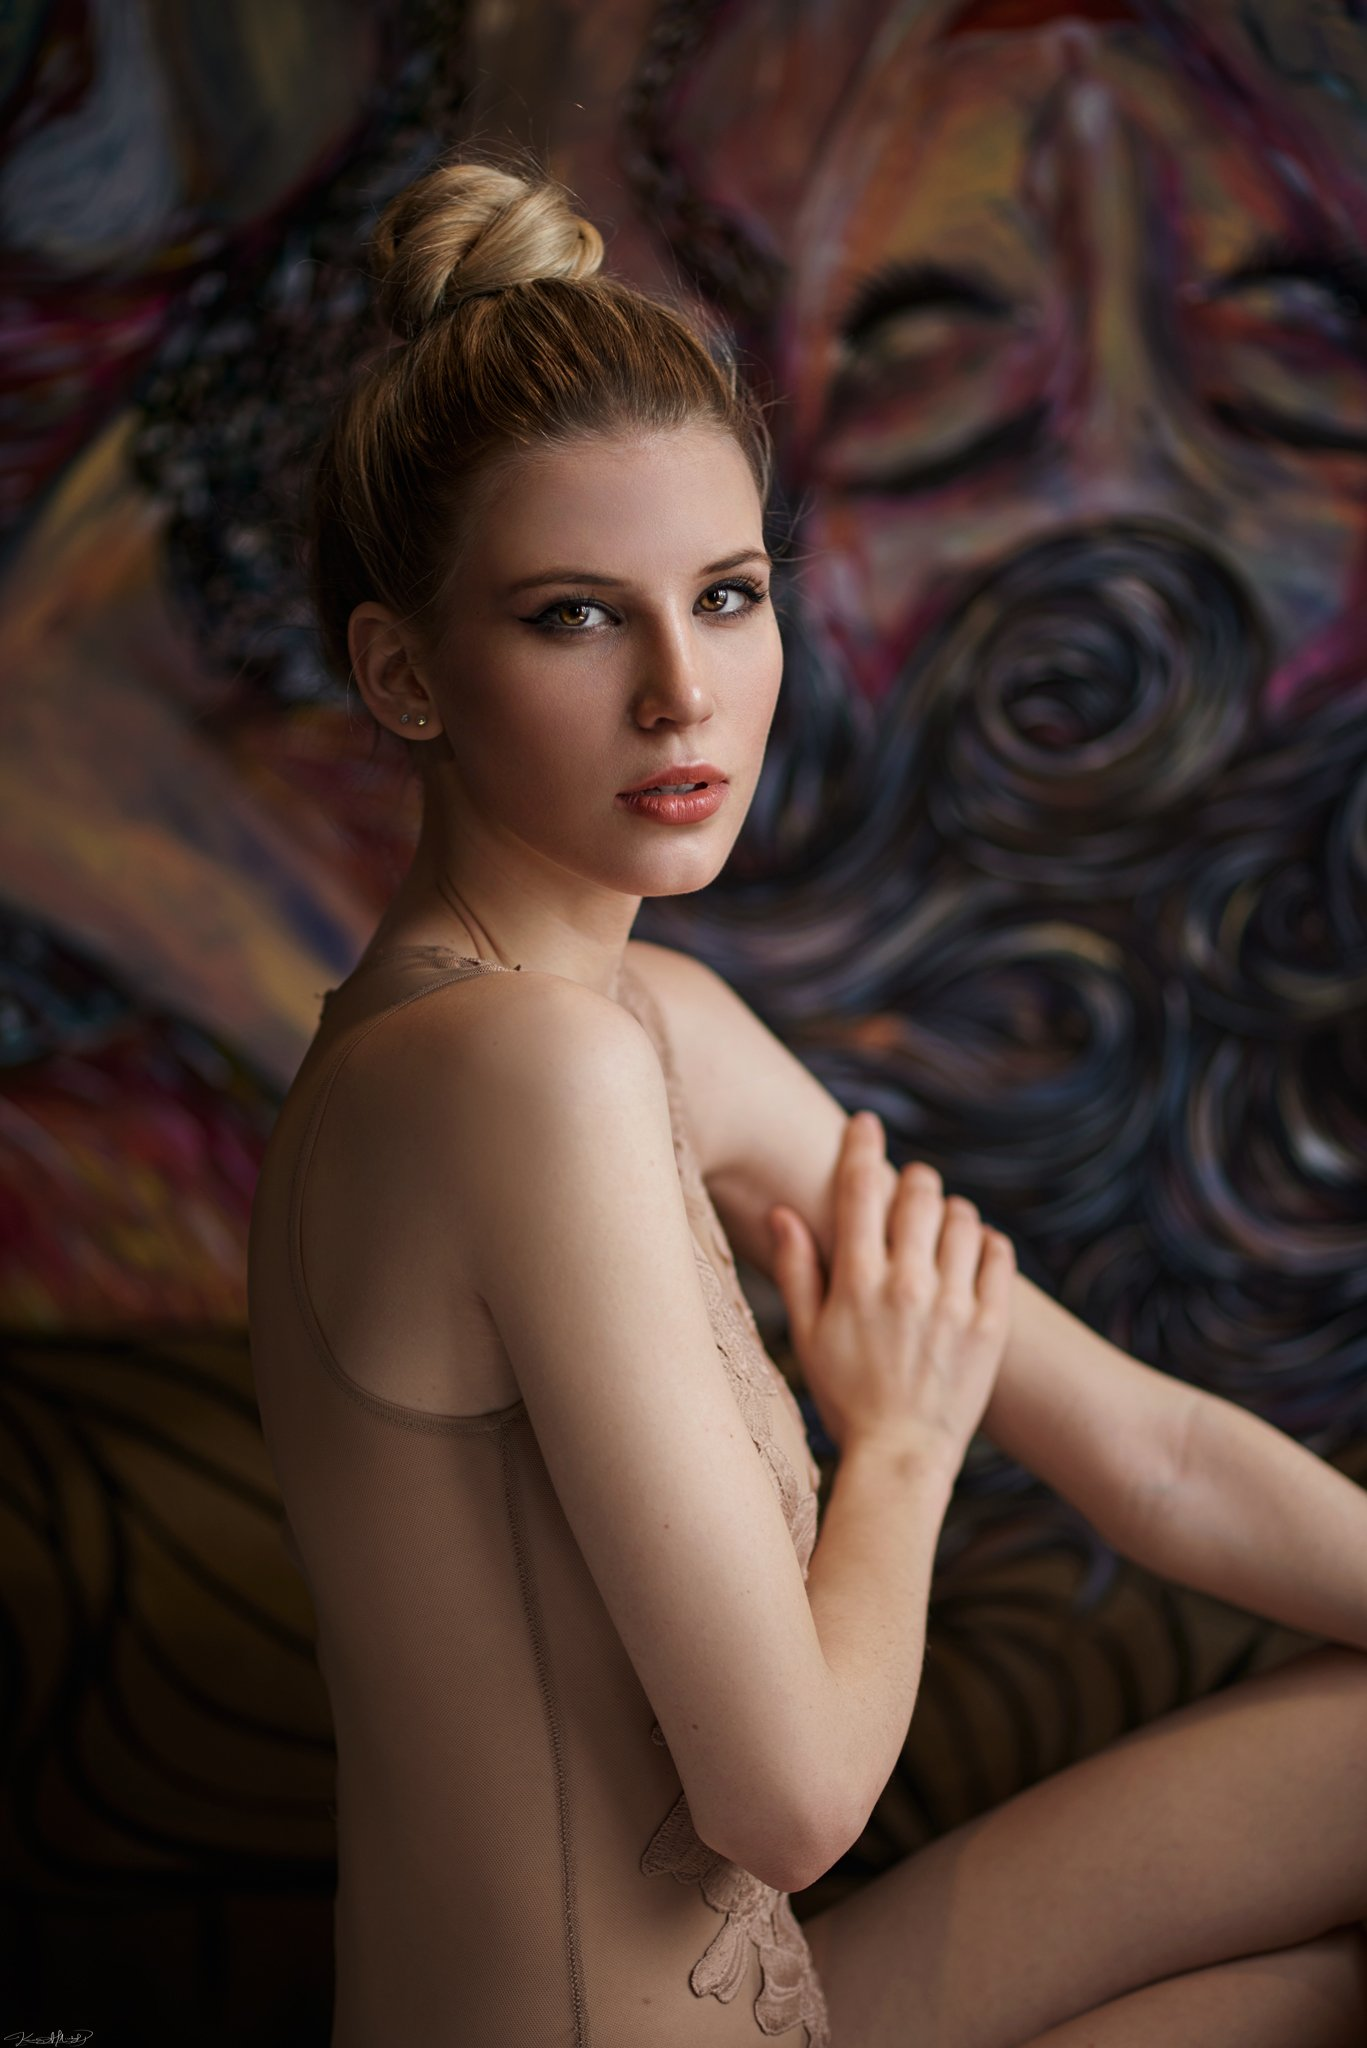 portrait, art, model, eyes, face, colors, natural, light, nikon, 85mm, Kaan ALTINDAL